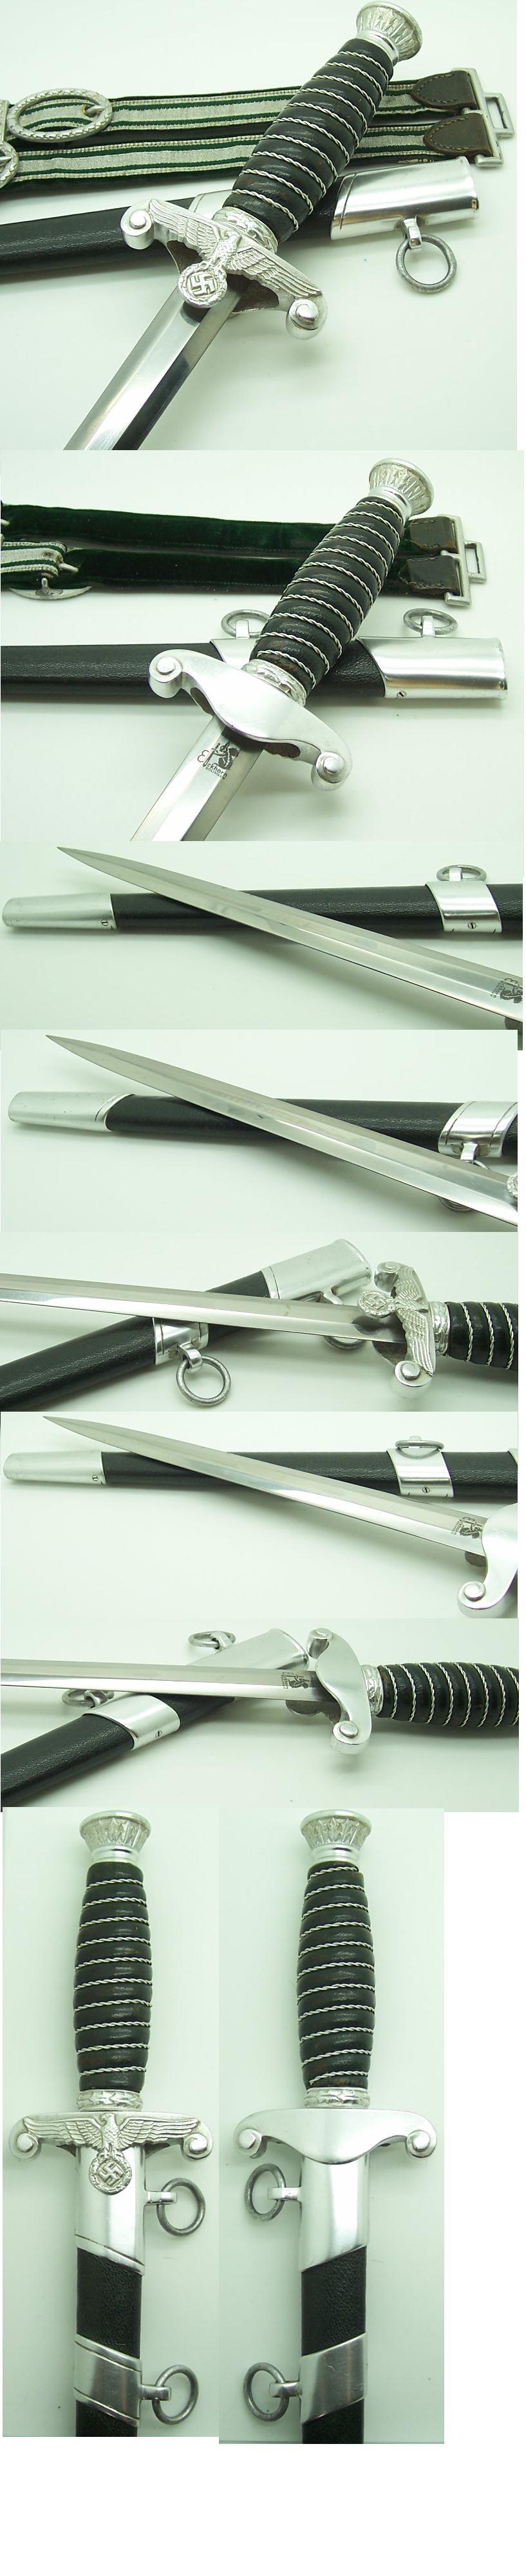 Land Customs Dagger with hangers by Eickhorn